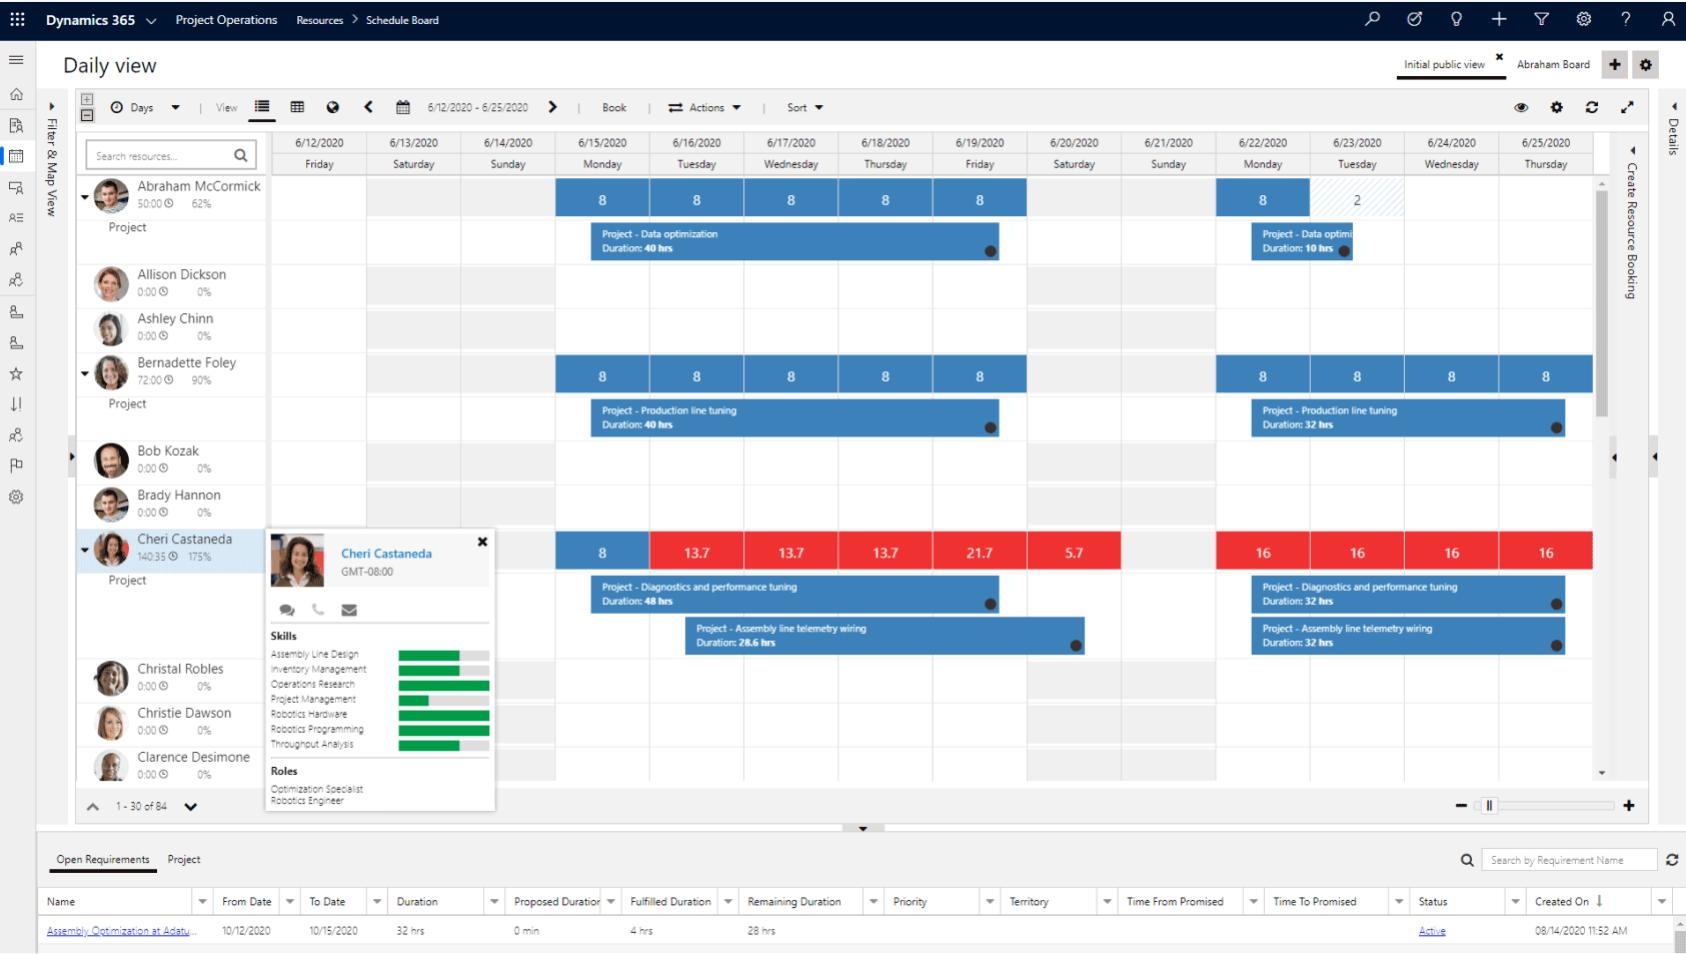 dynamics 365 timetable